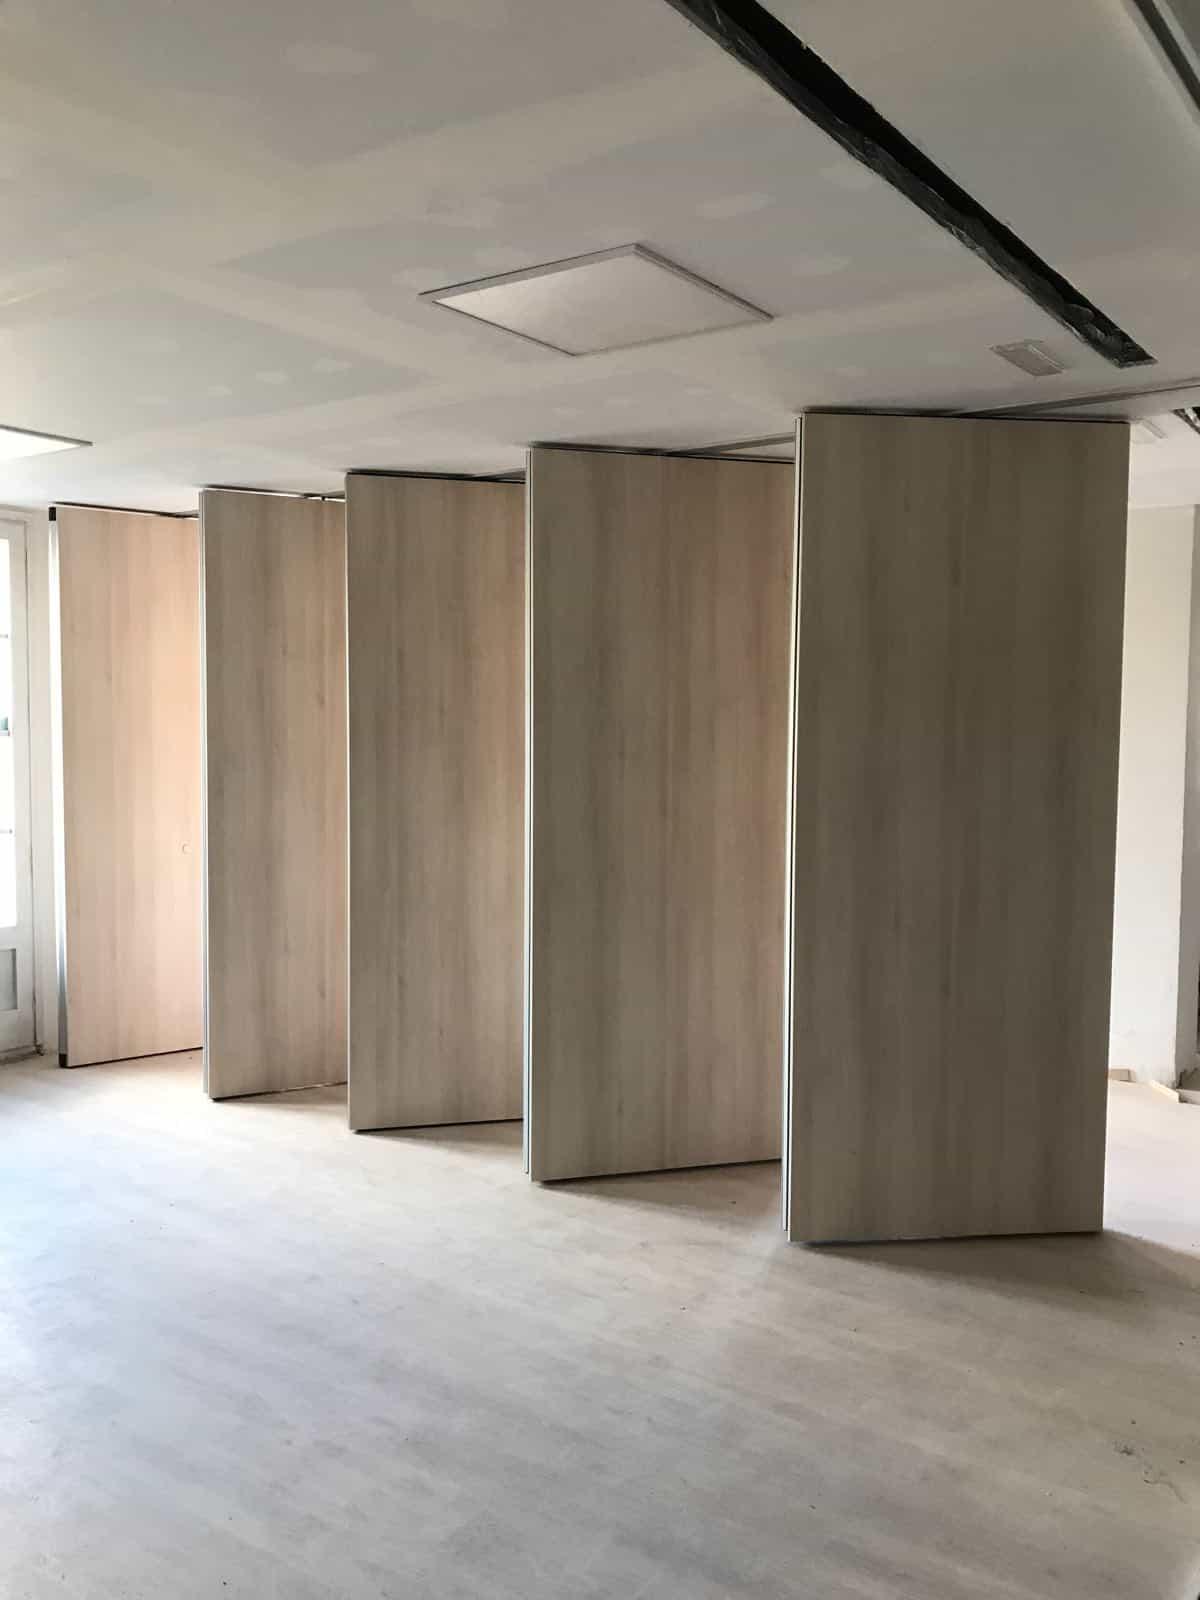 Tabiques m viles para espacios flexibles o adaptables kubointer - Tabiques moviles vivienda ...